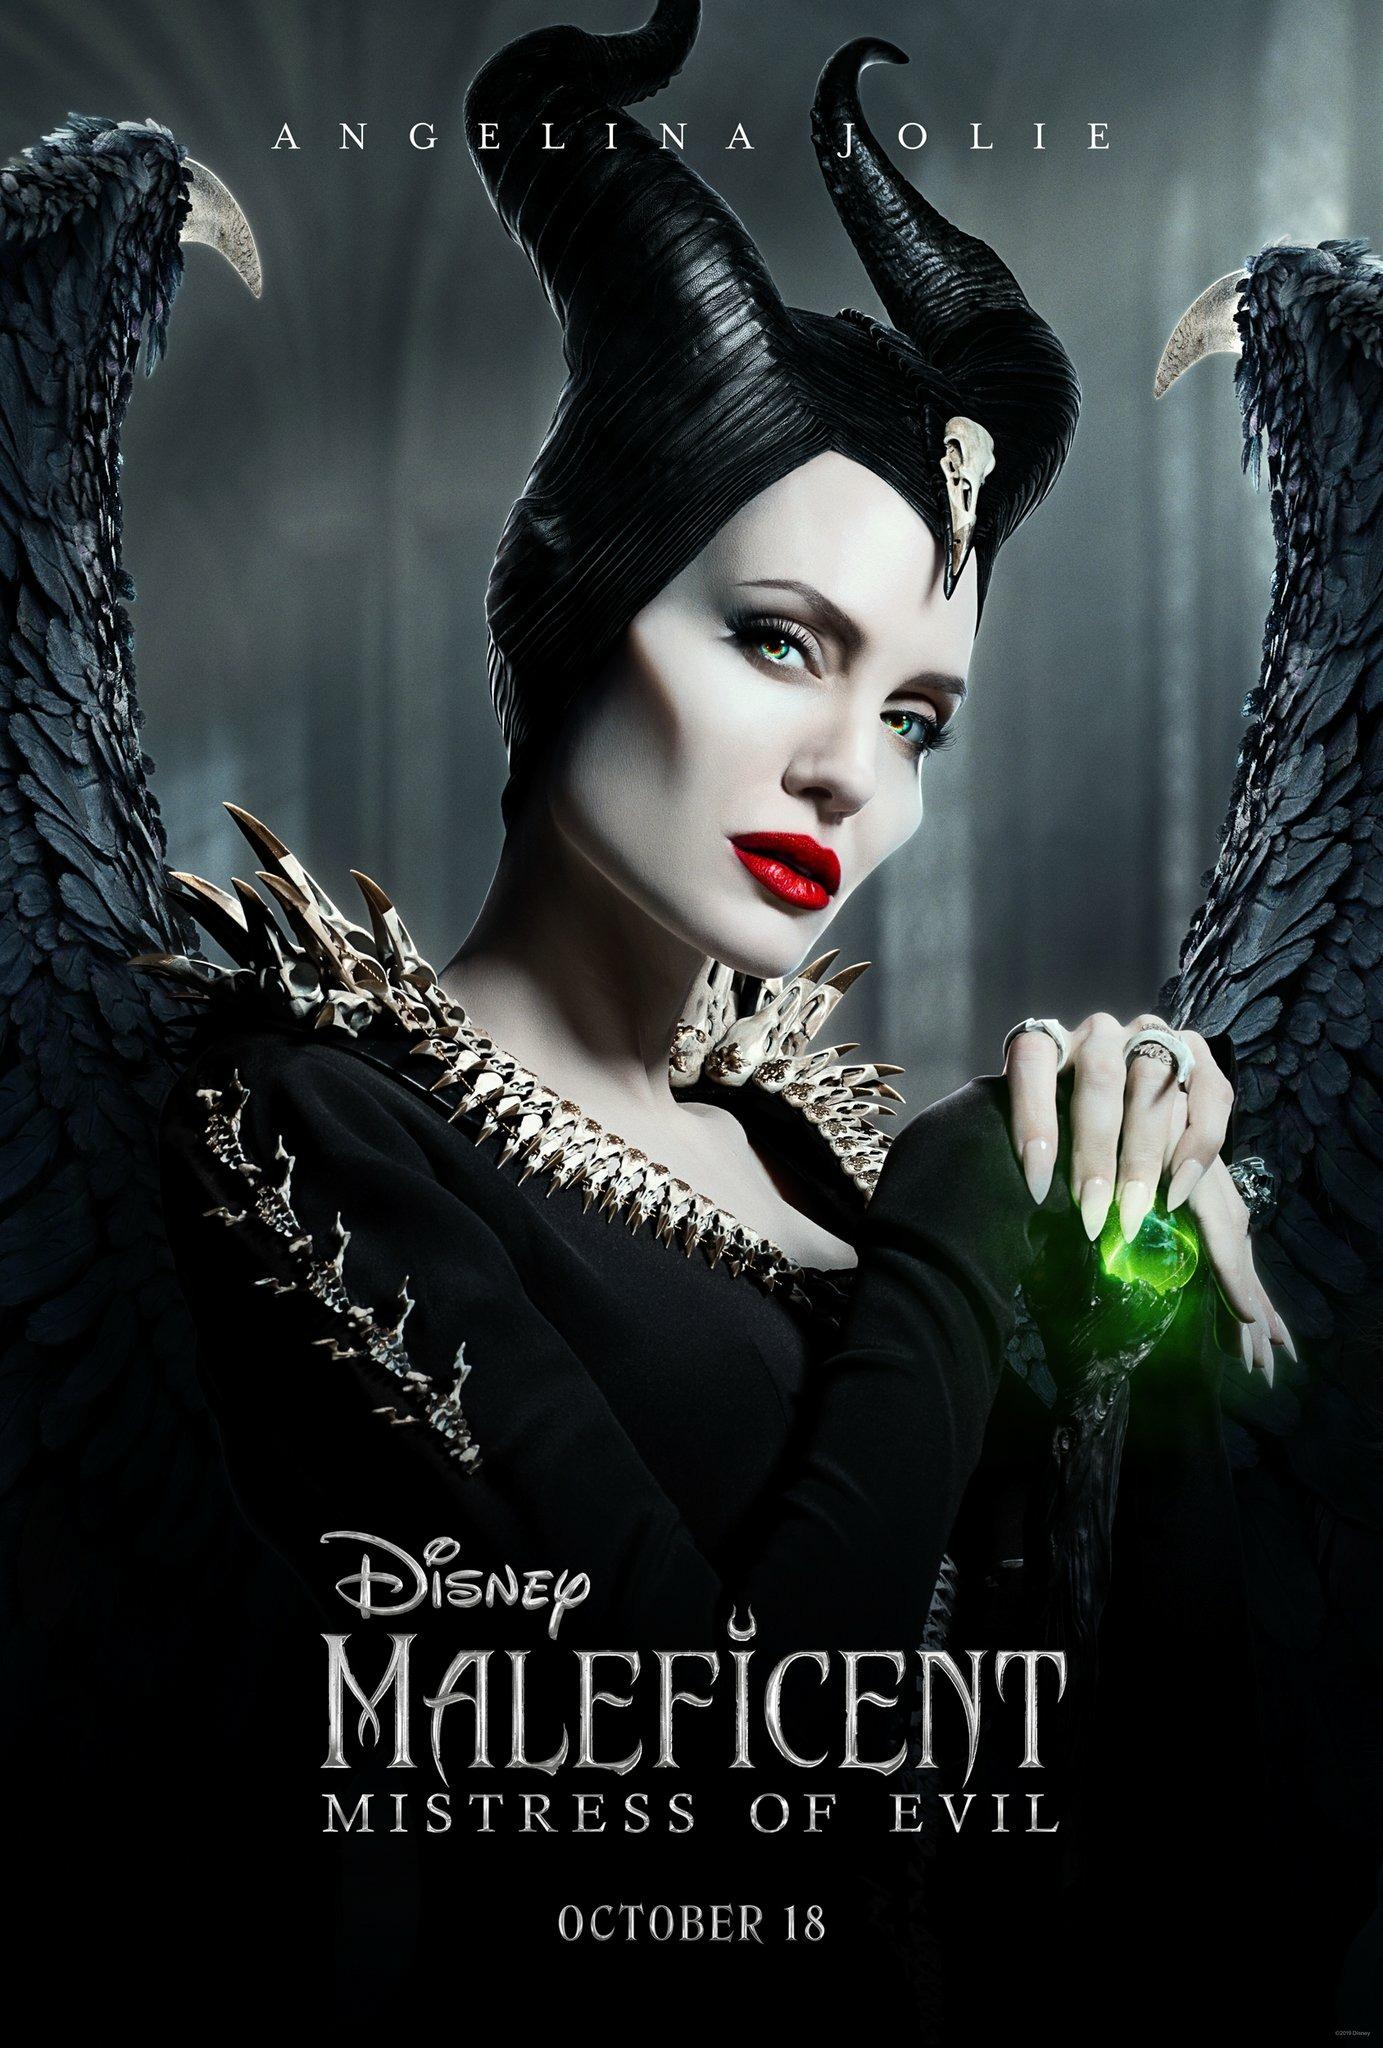 szmk_maleficent_demona_disney_csipkerozsika_a_sotetseg_urnoje_mistress_of_evil_5.jpg